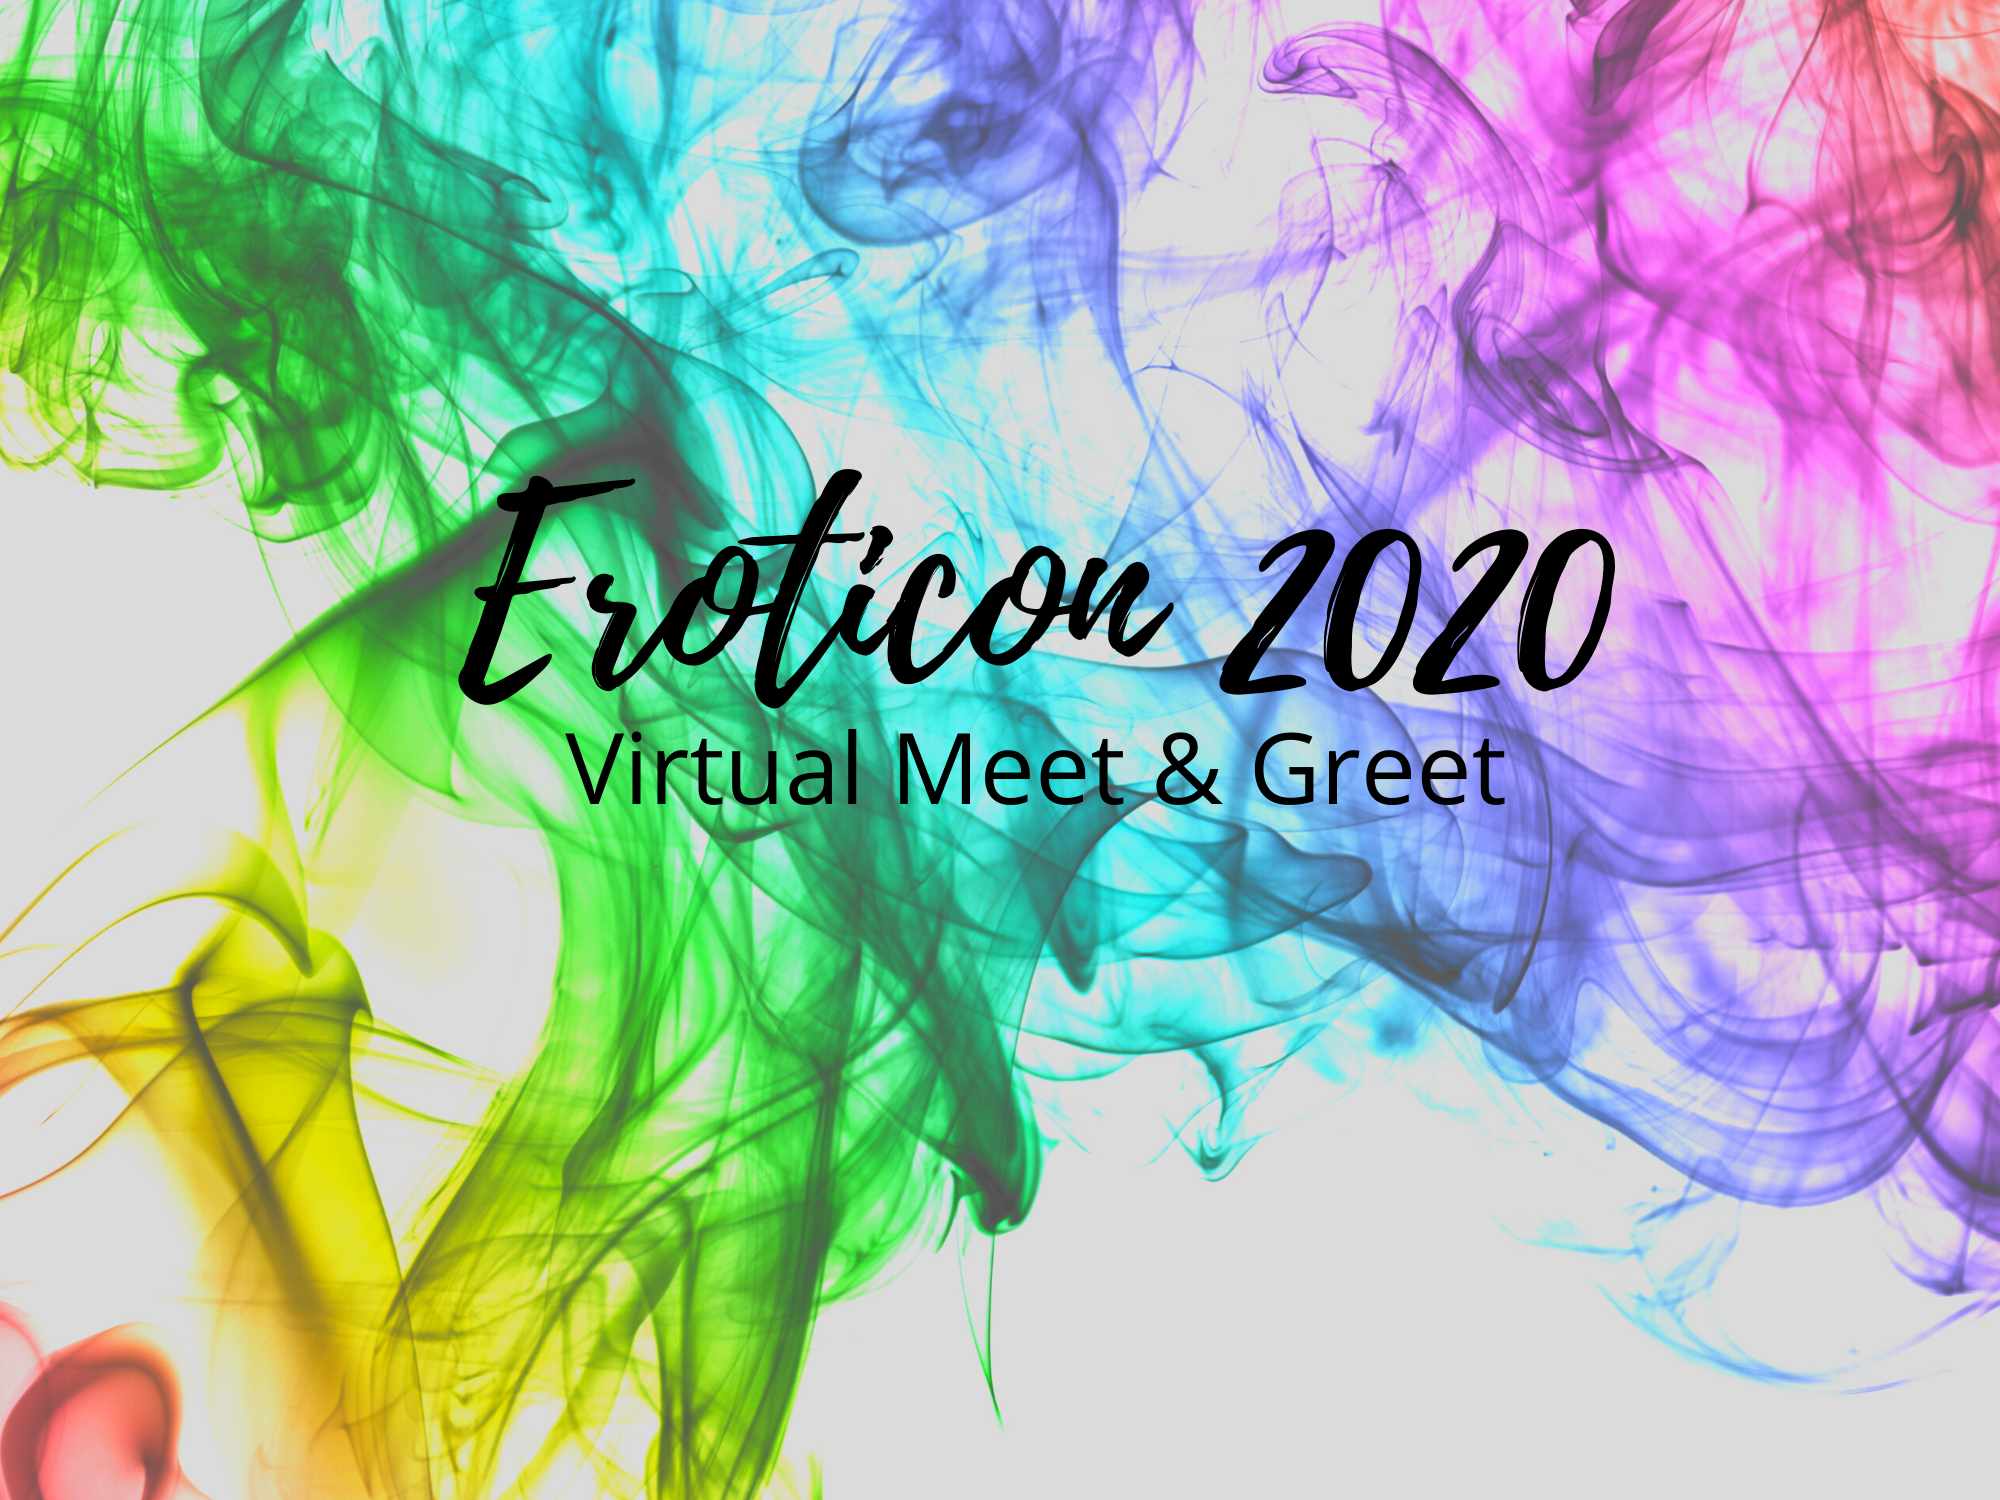 Eroticon 2020: Virtual Meet & Greet